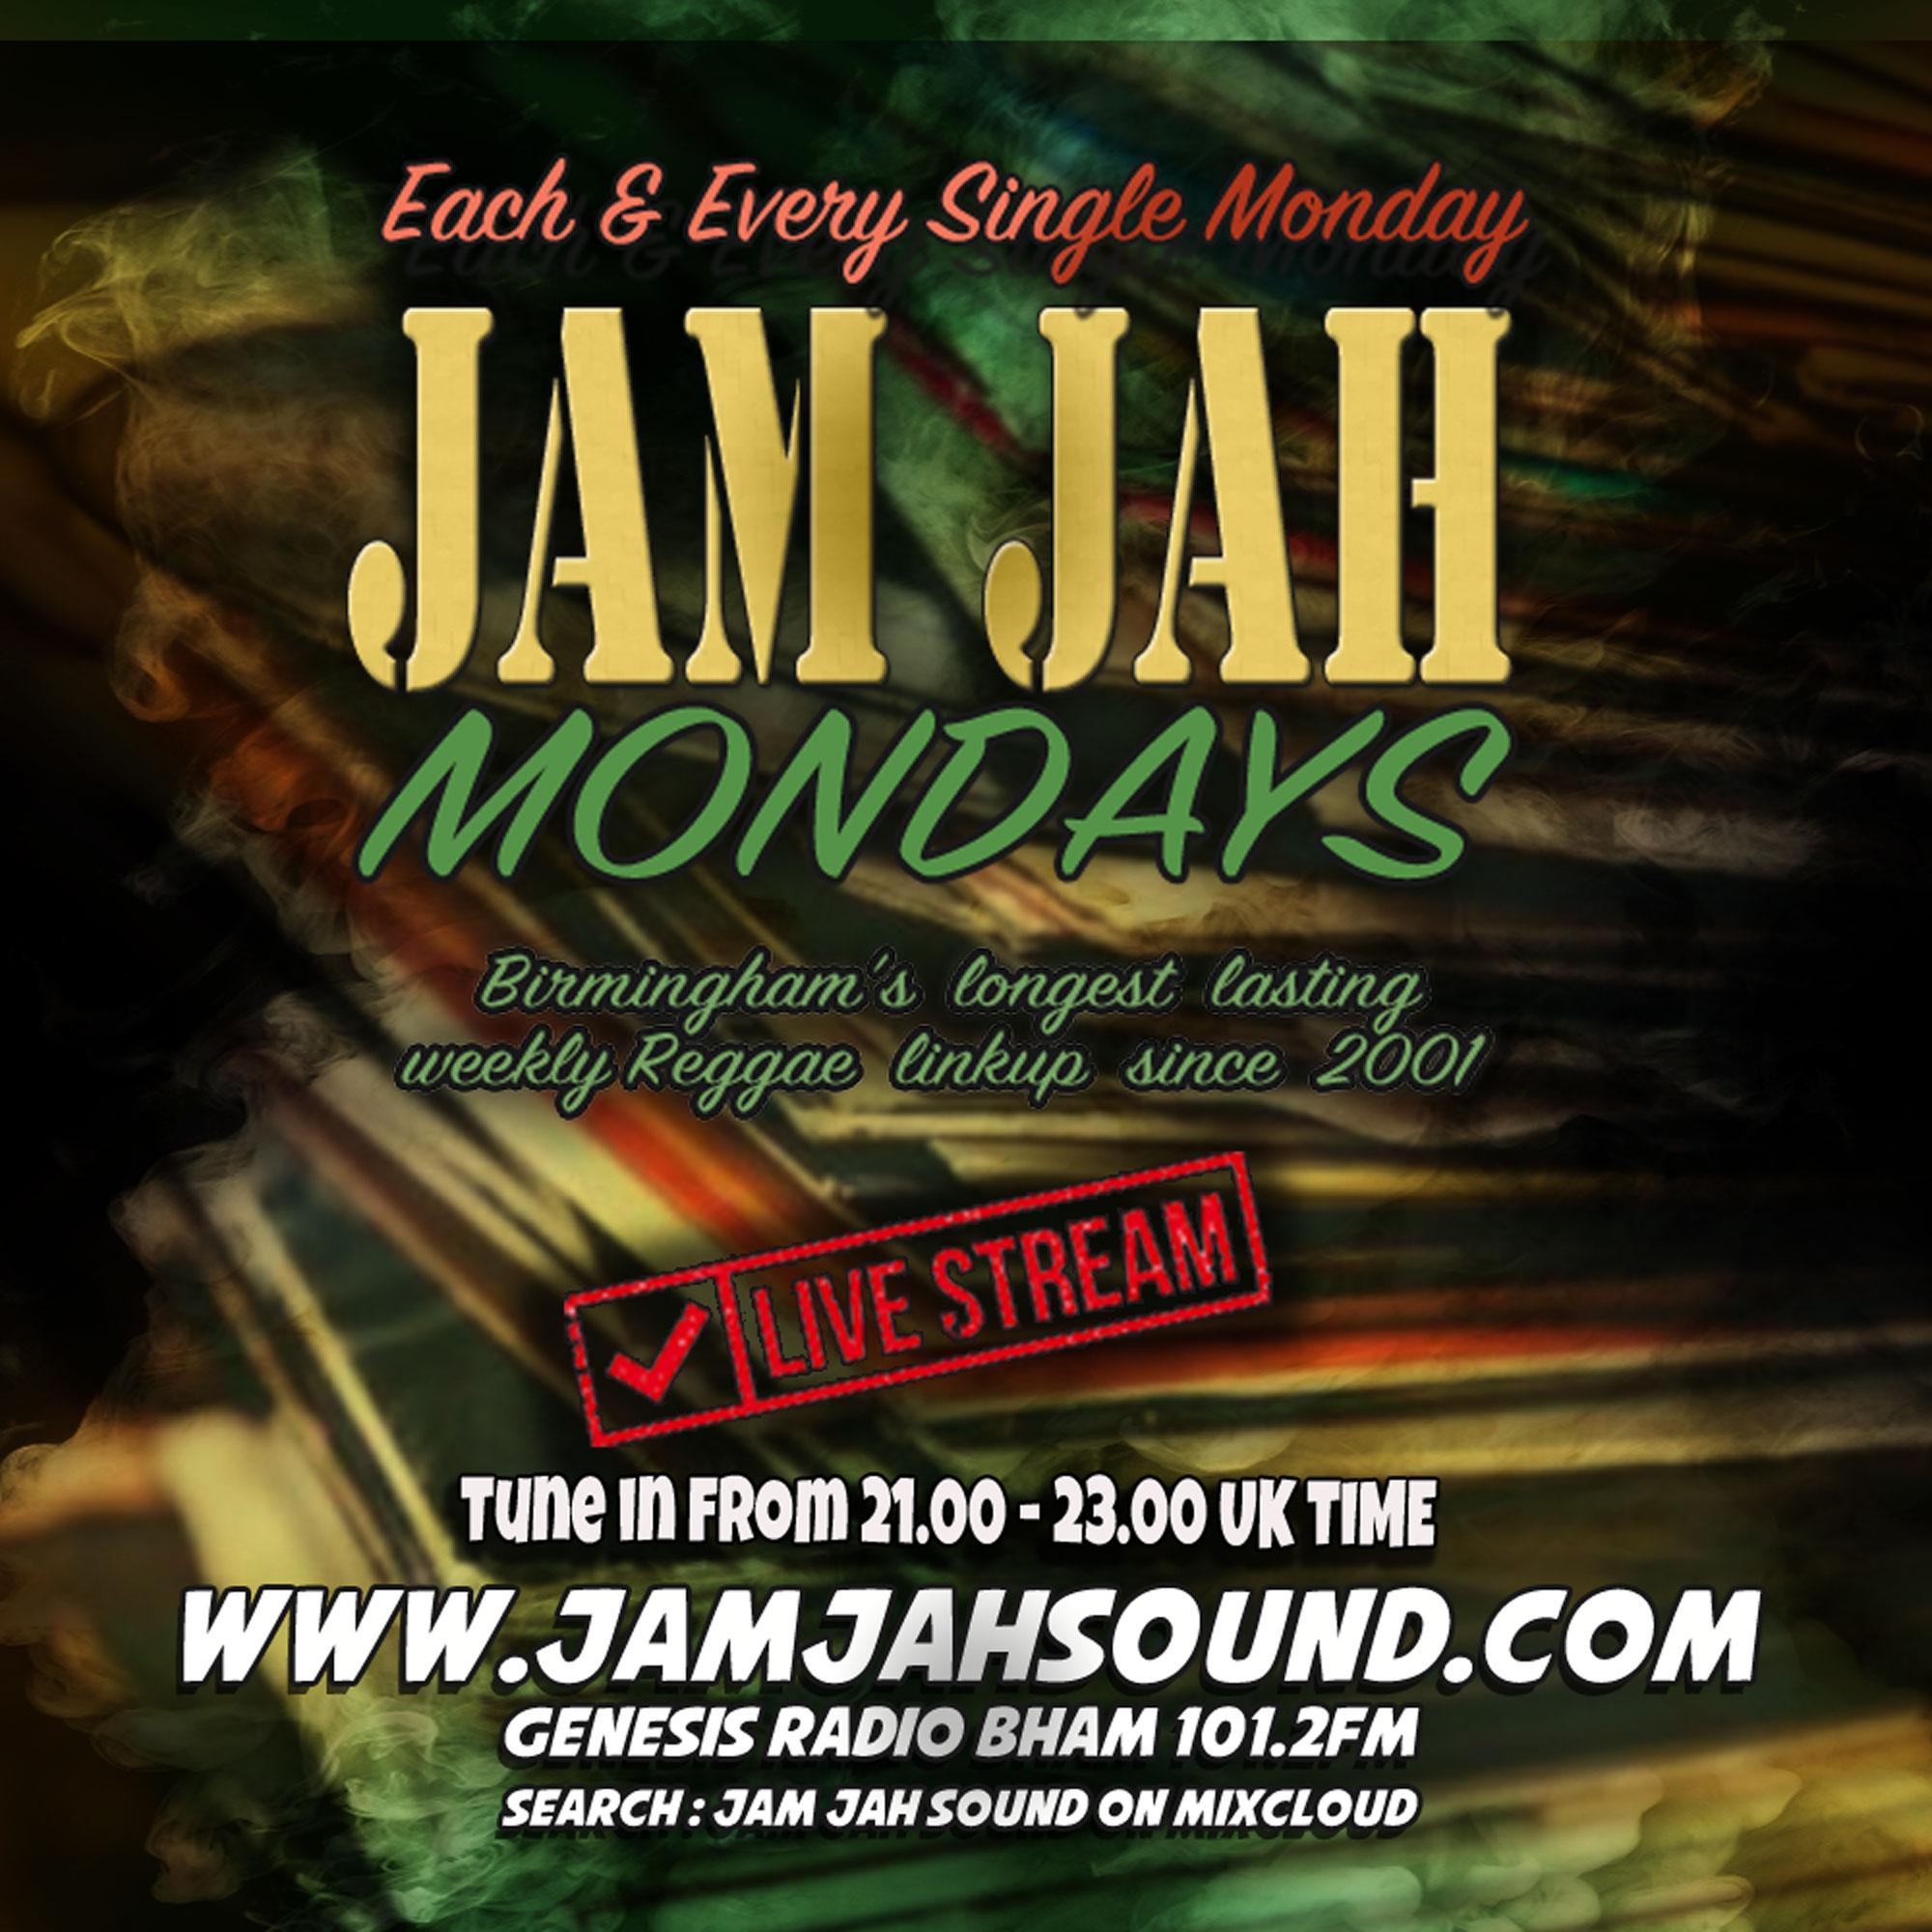 JJM-generic-stream-flyer